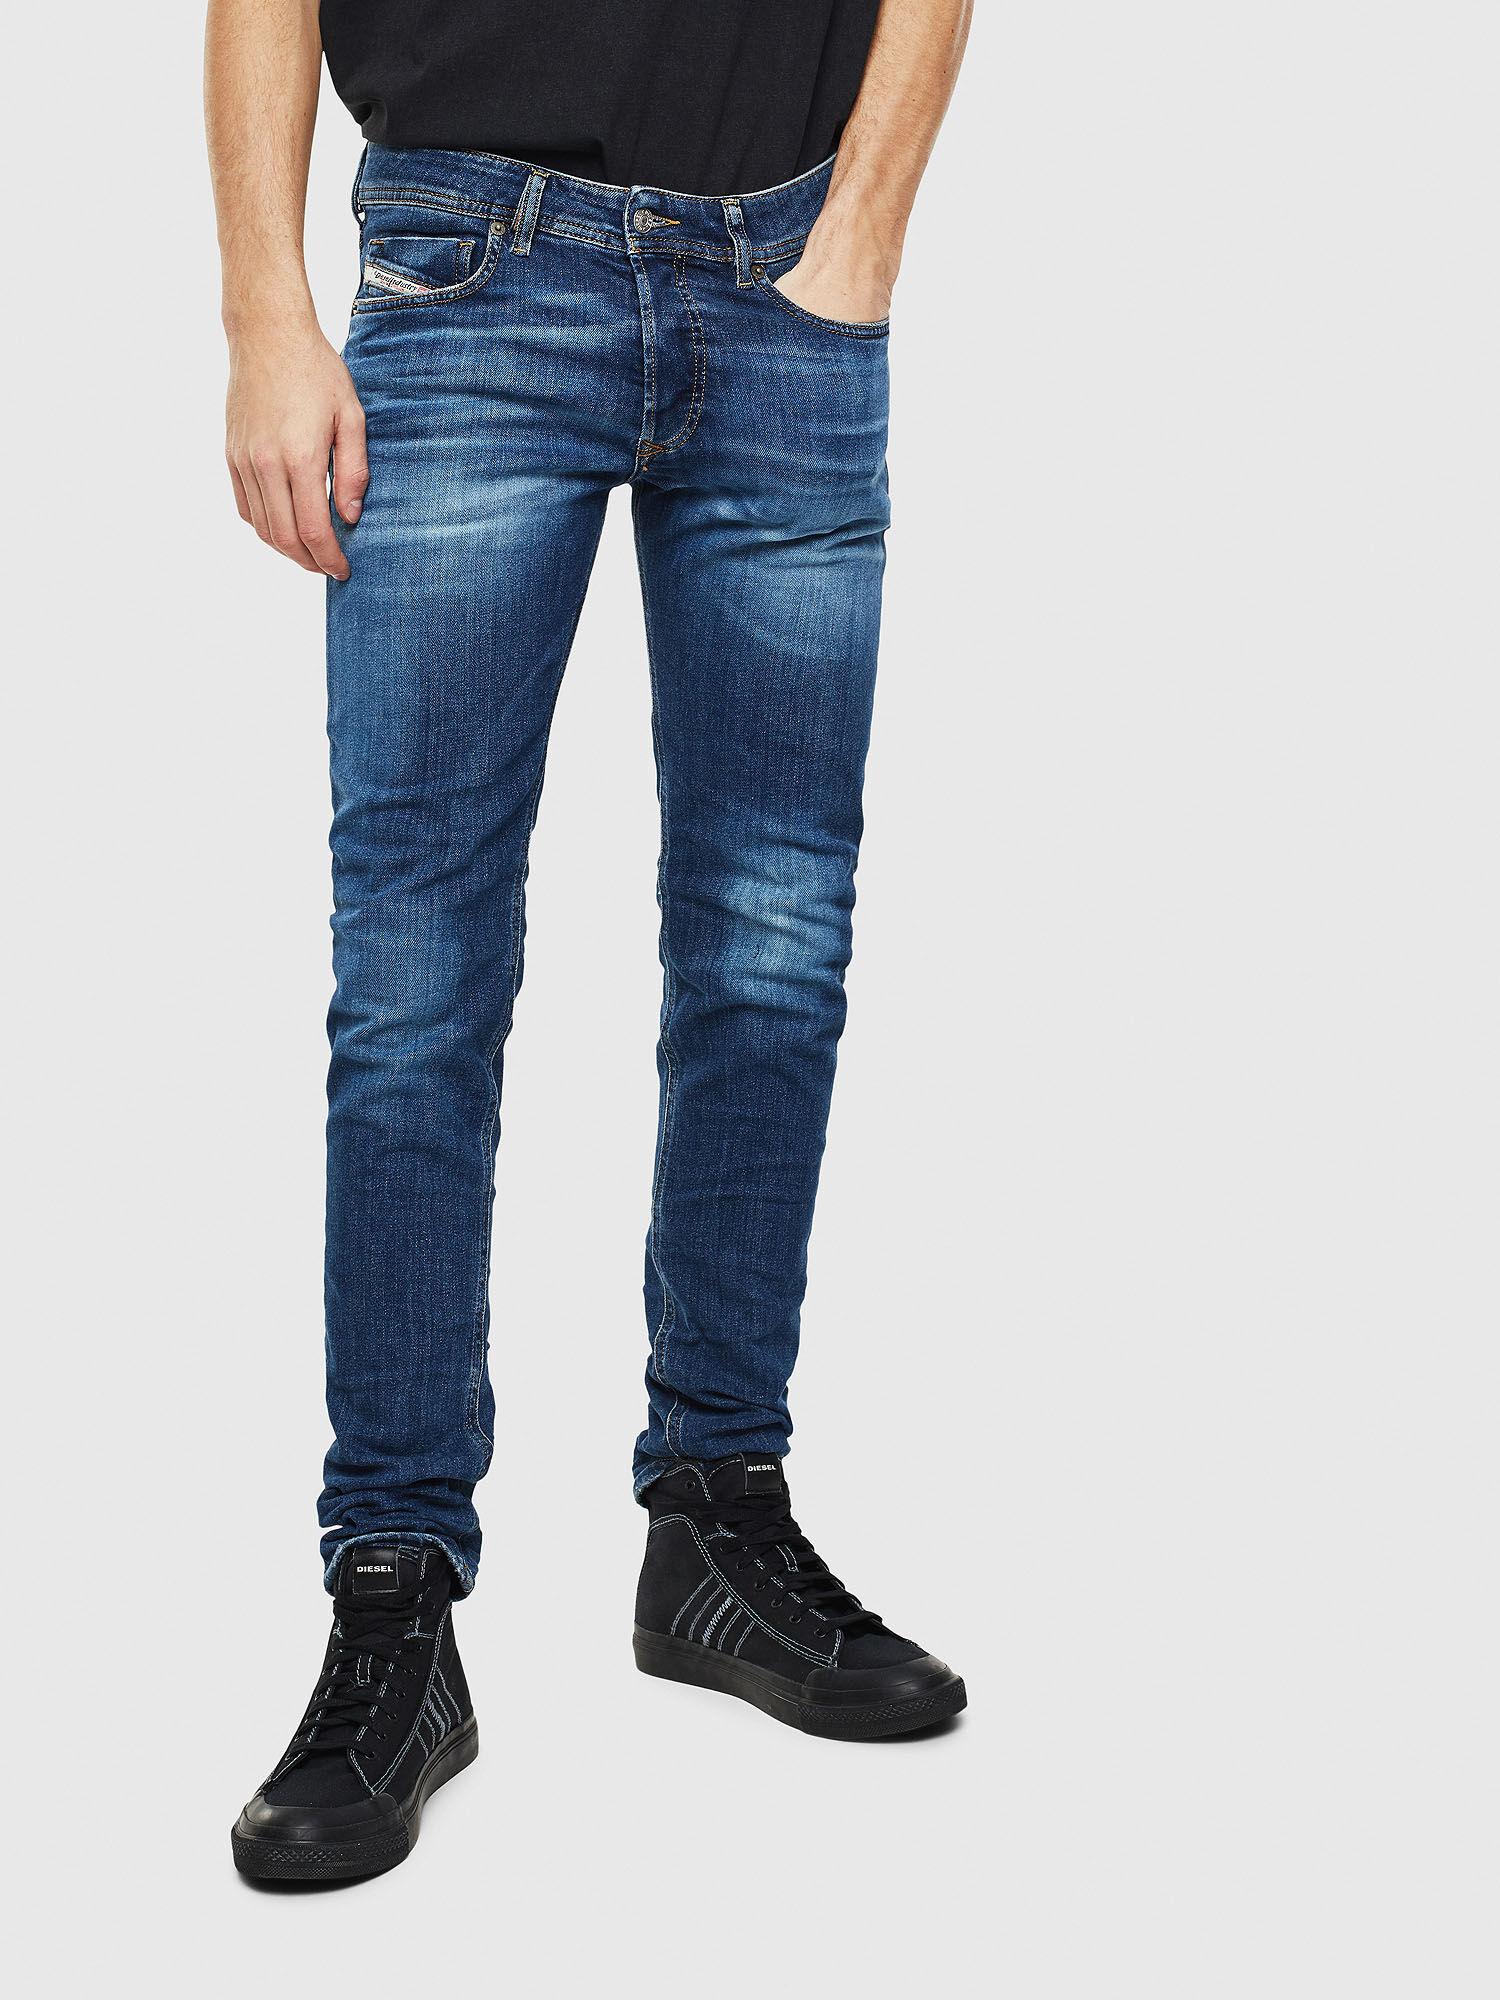 Jeans da Uomo DIESEL Sleenker 0842Q Skinny Jeans Stretch-Blu Denim Blu Scuro